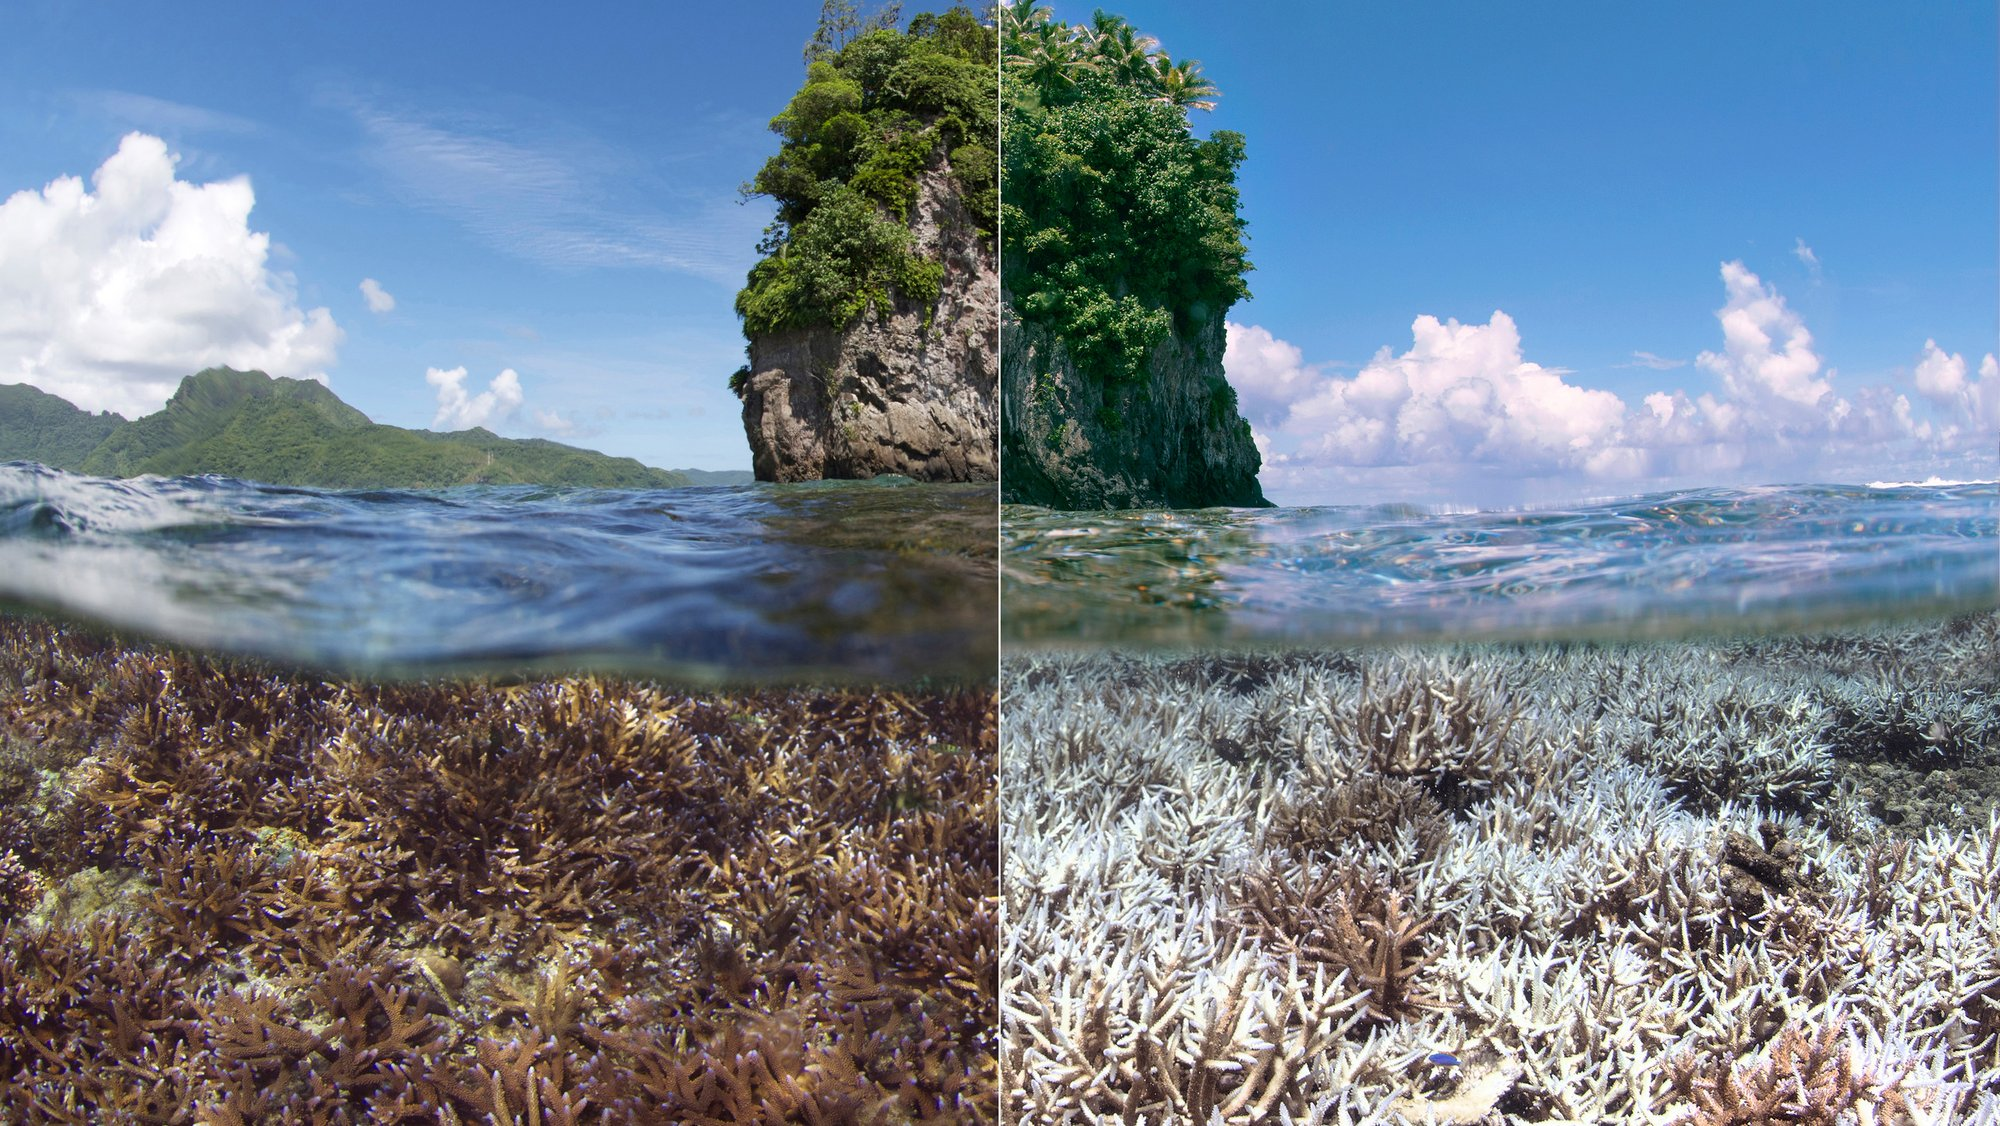 Google Keyword Chasing Coral Image 003.jpg